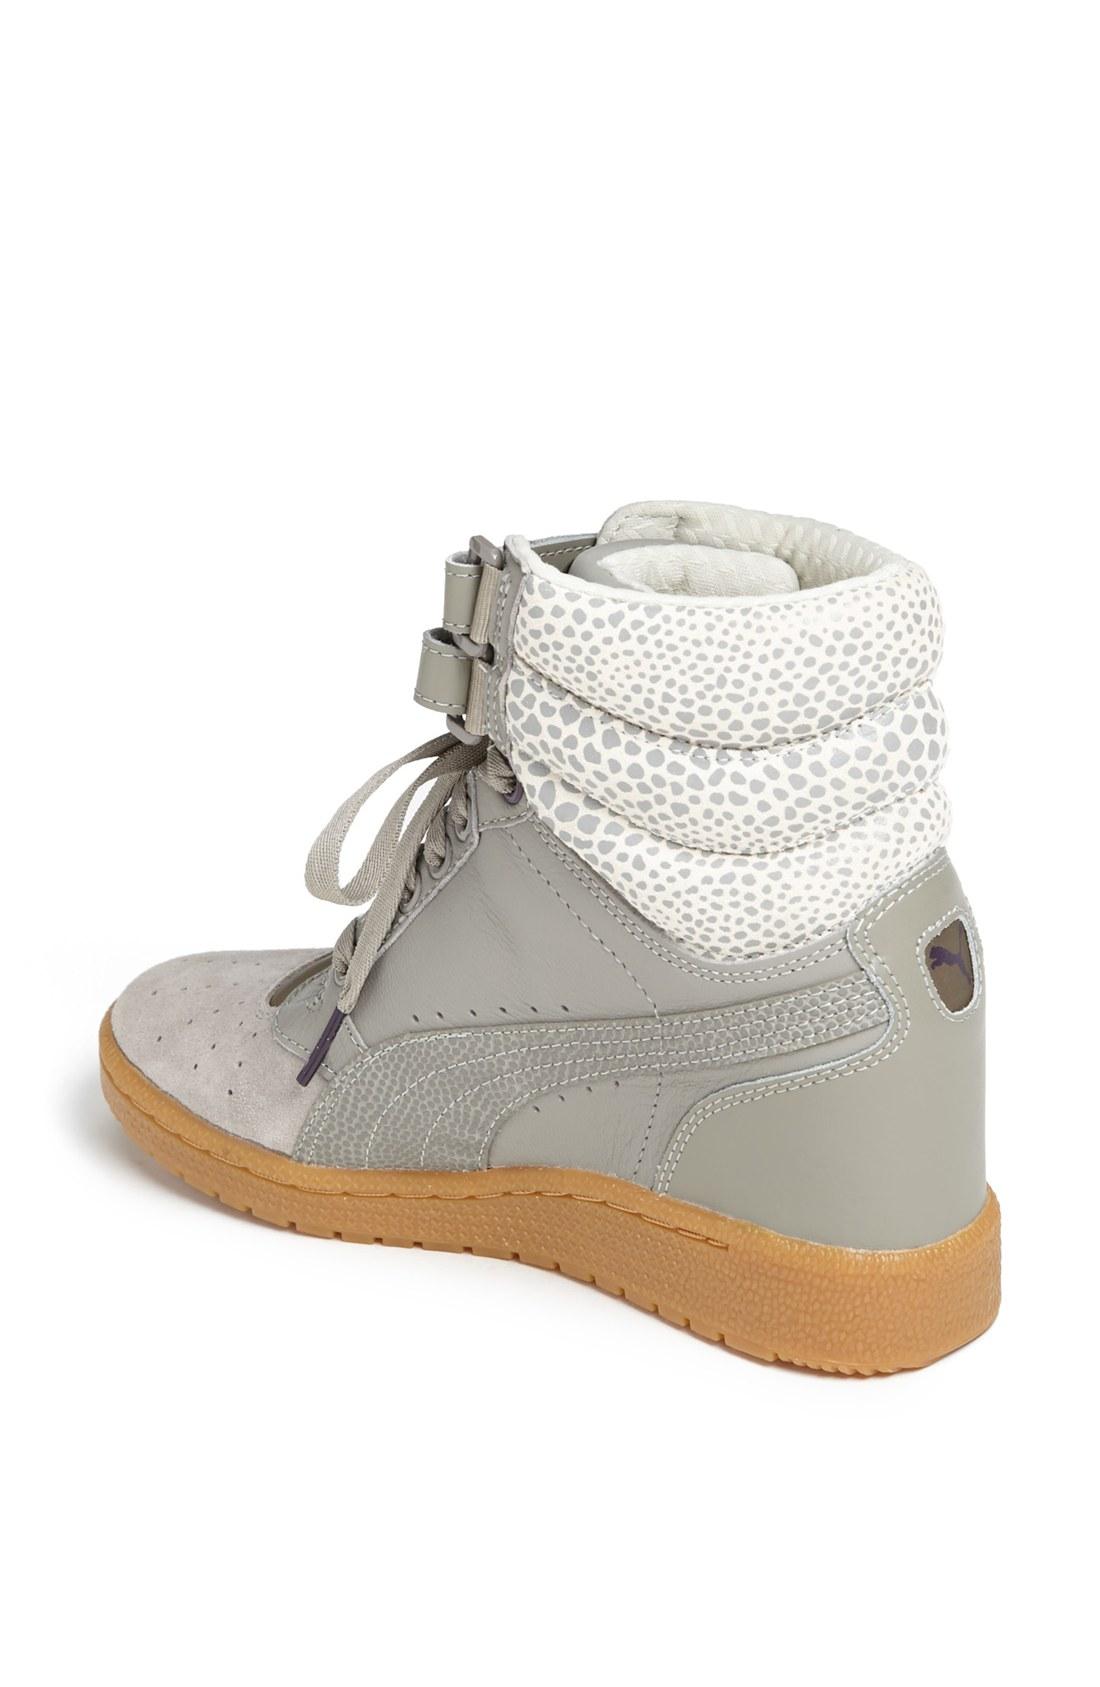 puma sky wedge women  39 s sneakers winter white  790a9388d